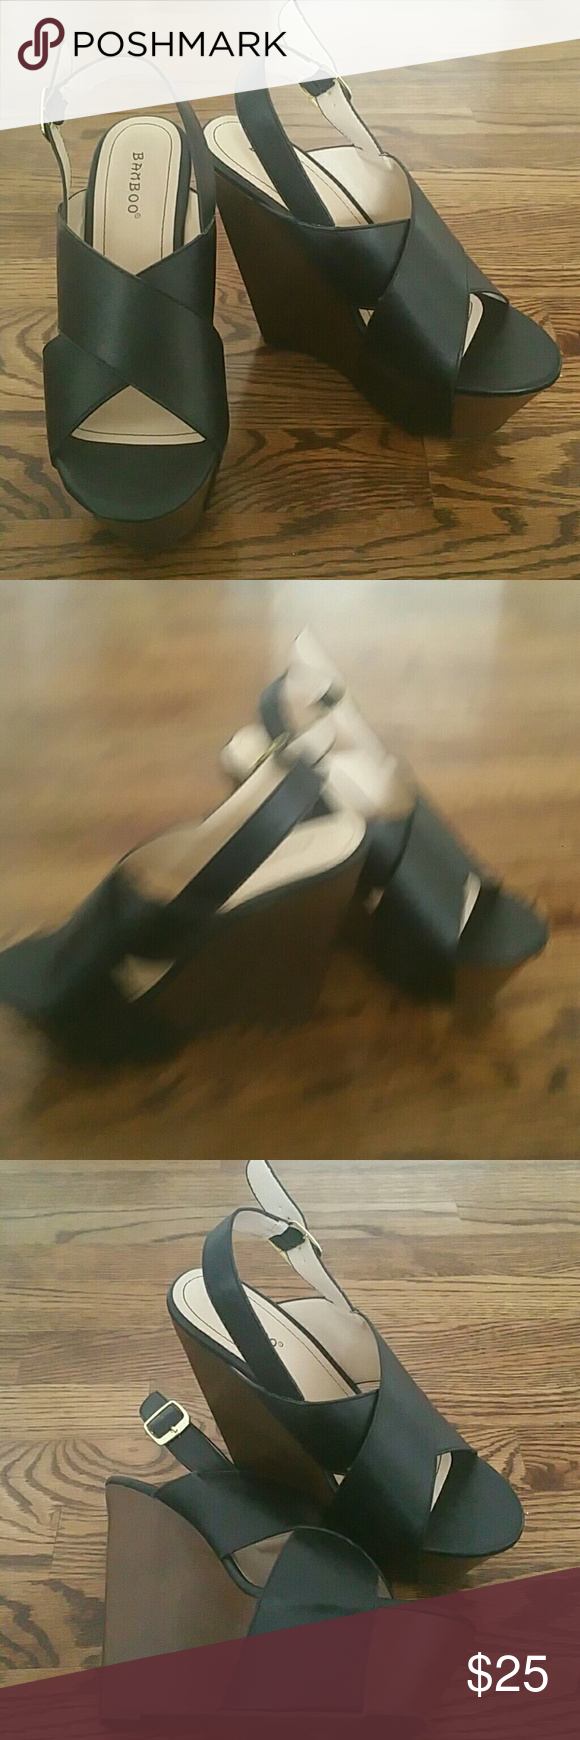 Wedges Brand new, never worn black heel wedges. Charlotte Russe Shoes Wedges